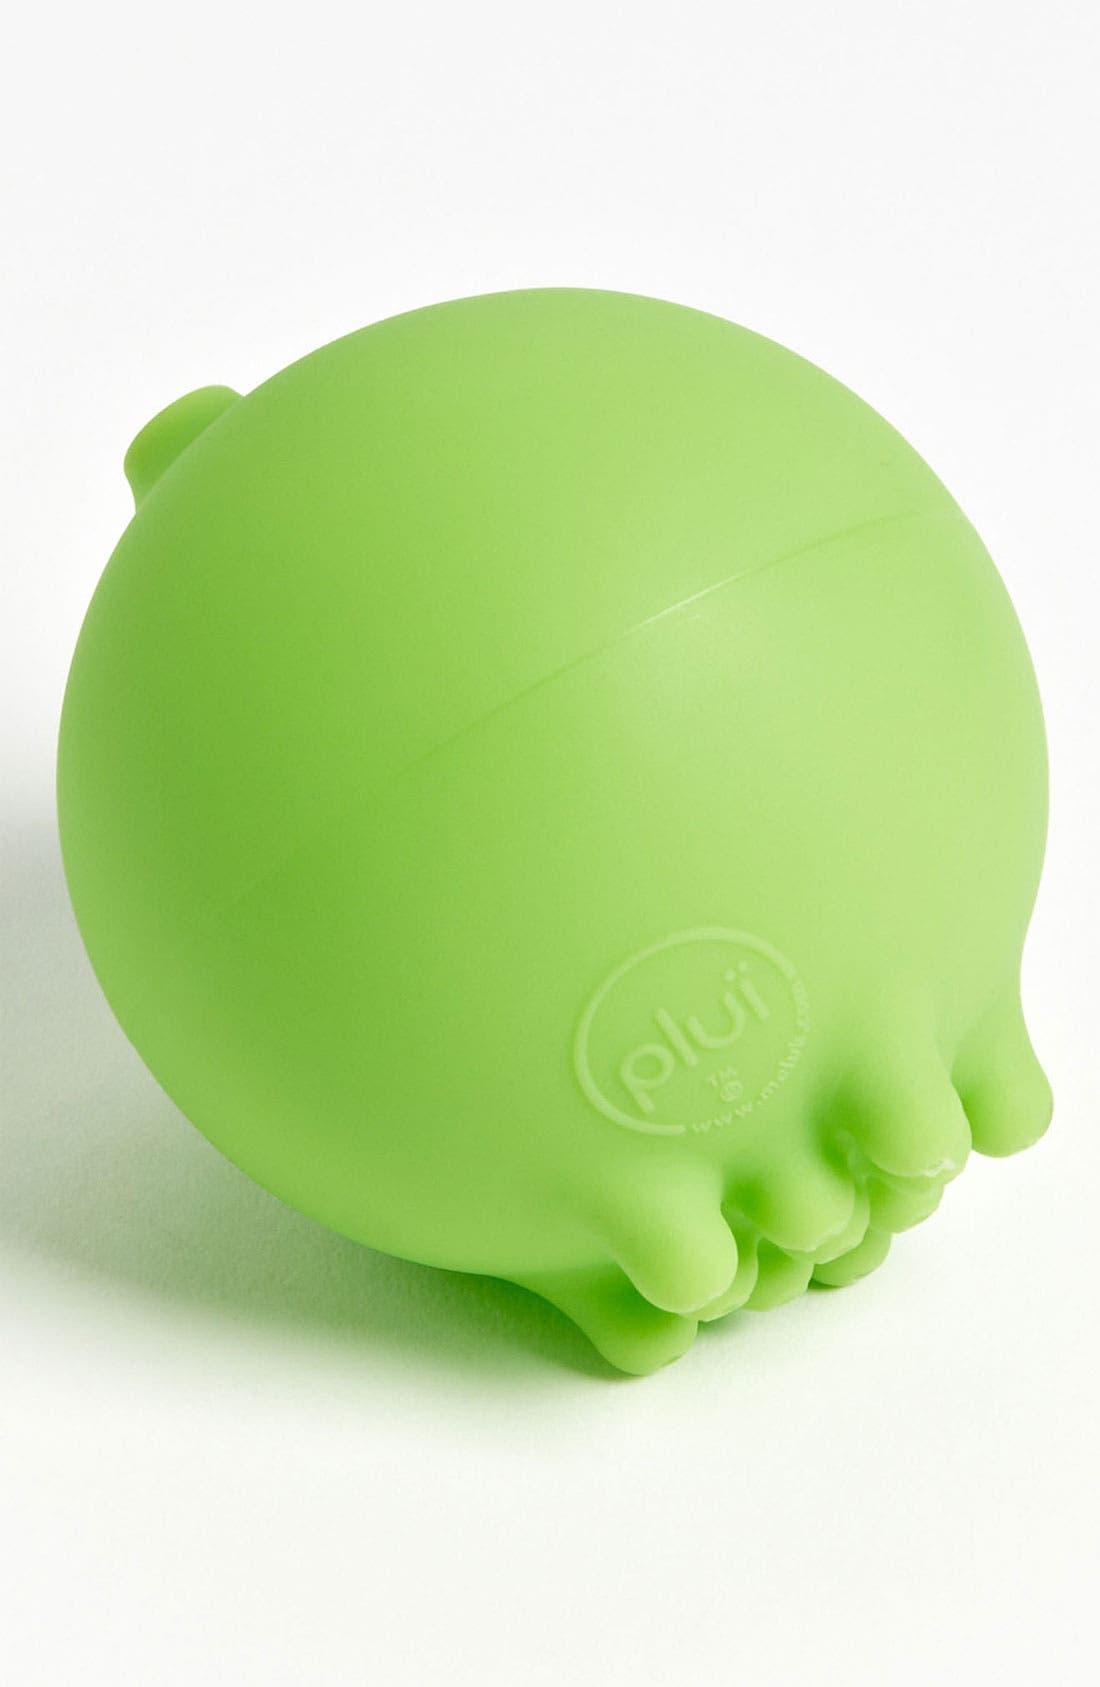 Alternate Image 1 Selected - Kid O 'Plui' Bath Toy